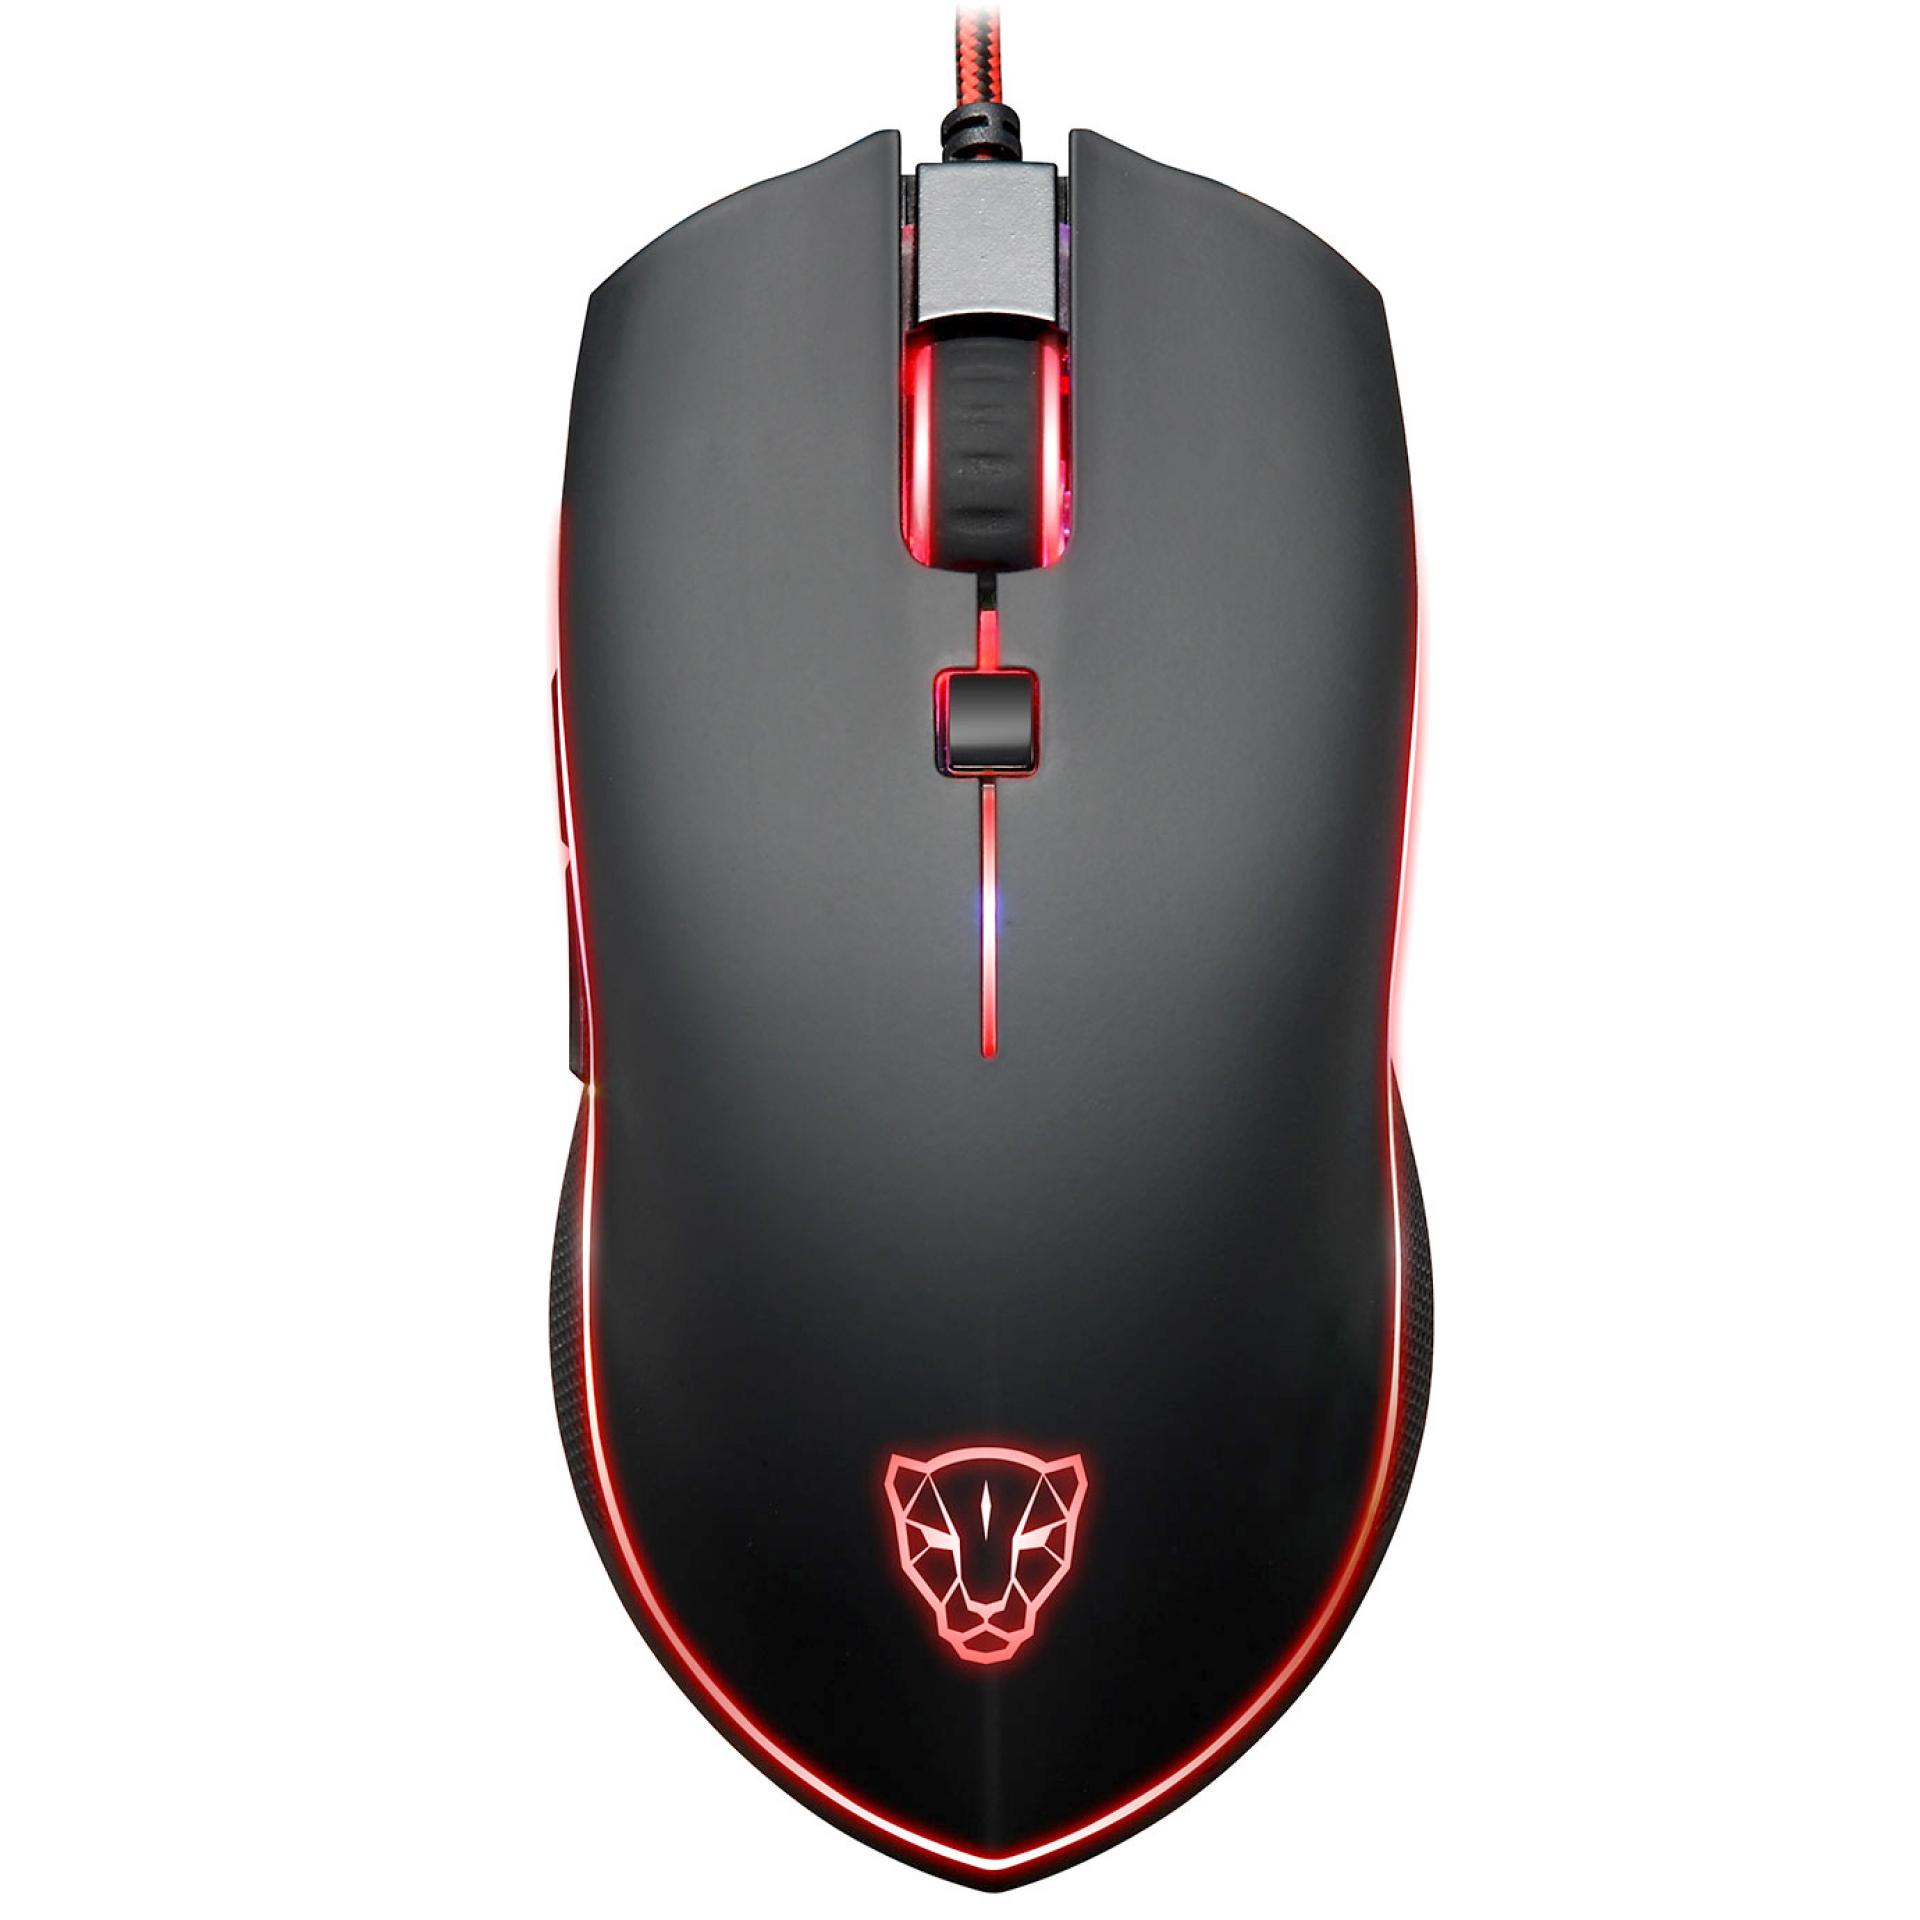 Motospeed V40 Electron-optical USB Gaming Mouse